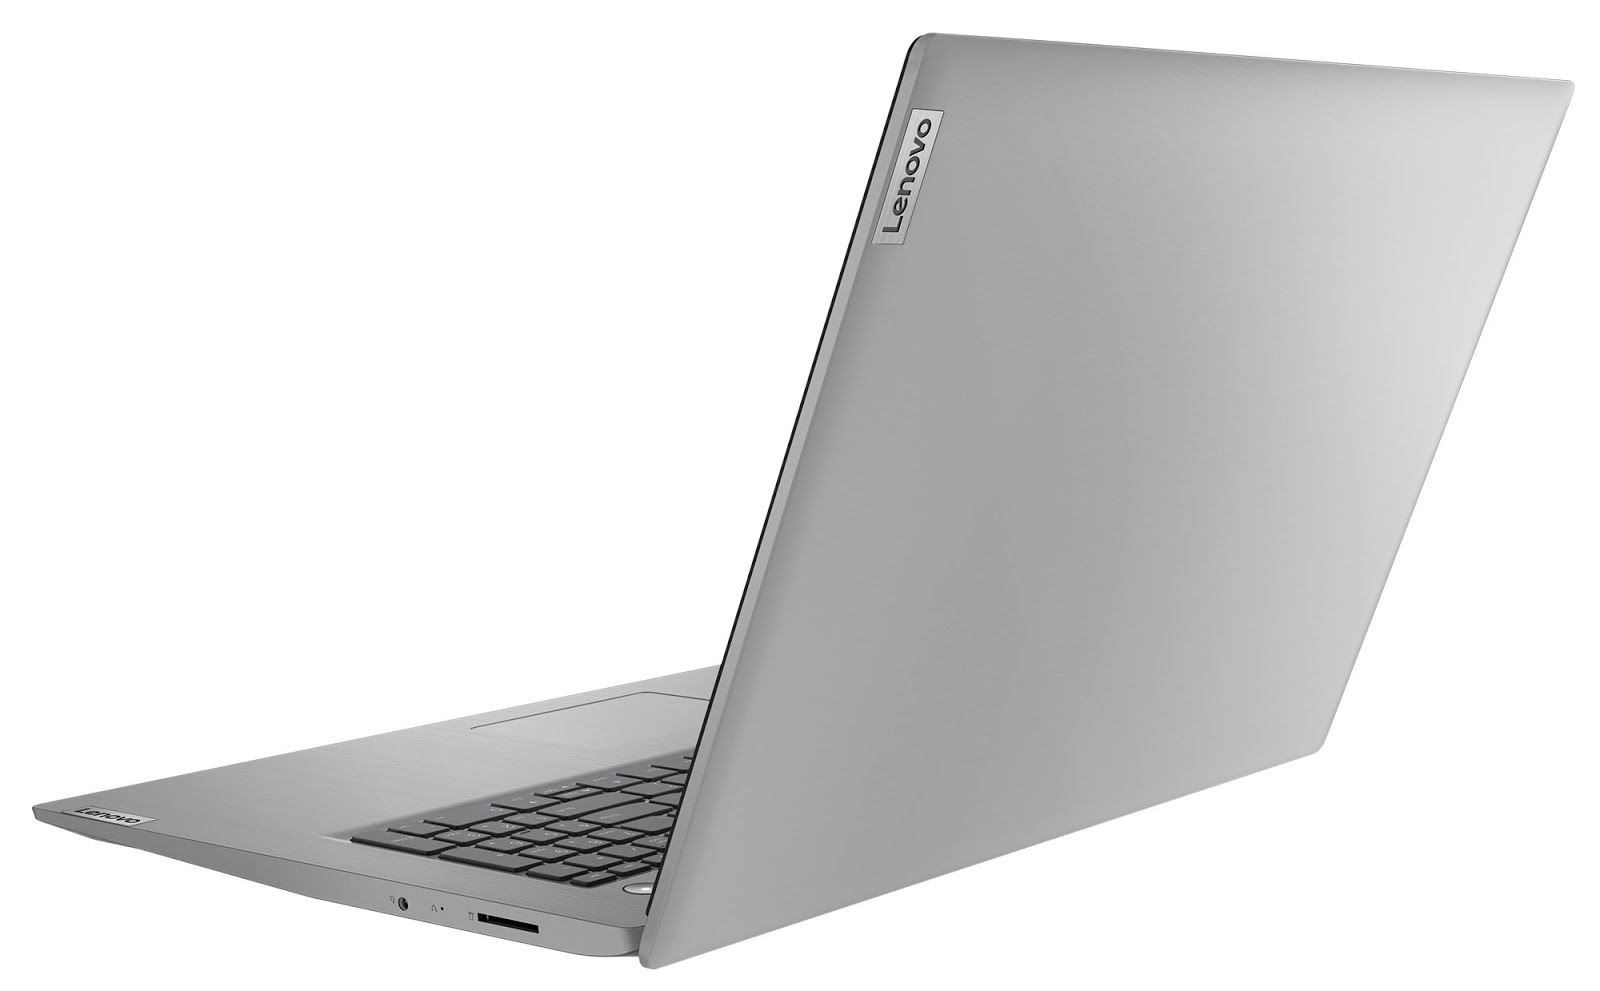 Фото 1. Ноутбук Lenovo ideapad 3 17IML05 Platinum Grey (81WC004ERE)